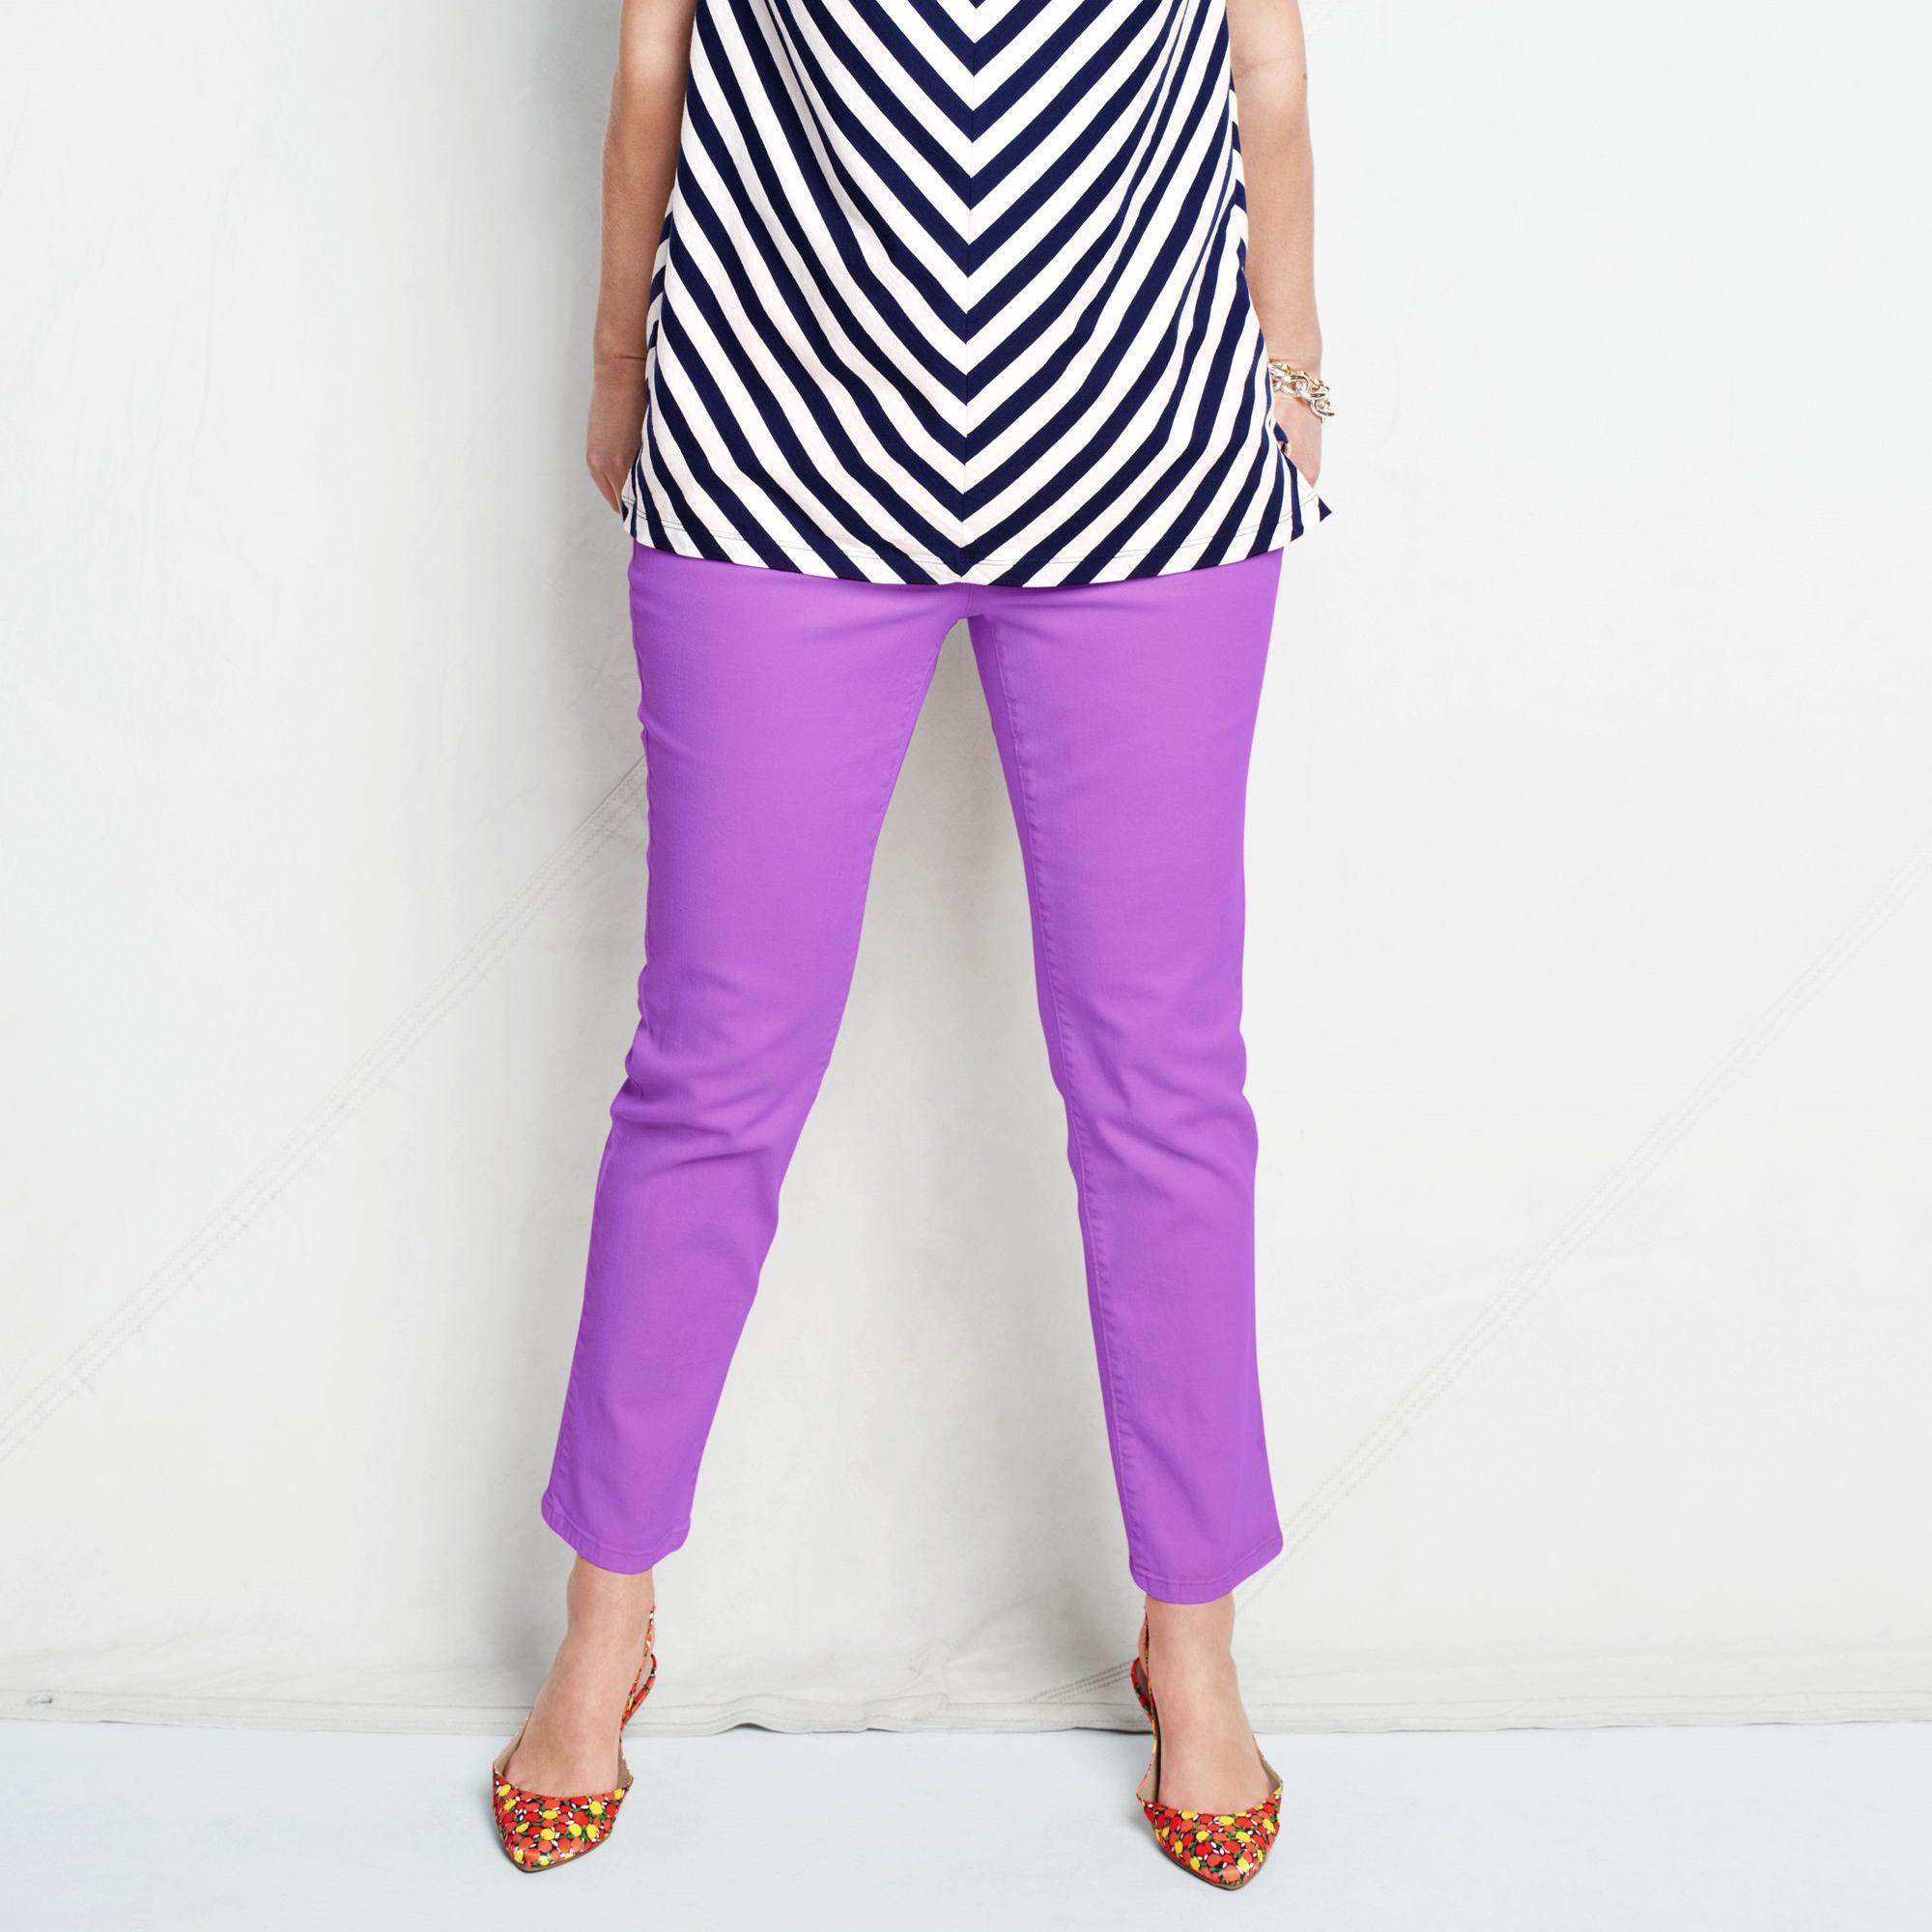 Womens Plus Coloured Low Rise Slim Ankle Jeans - 20 - PURPLE Lands End iq8WTl